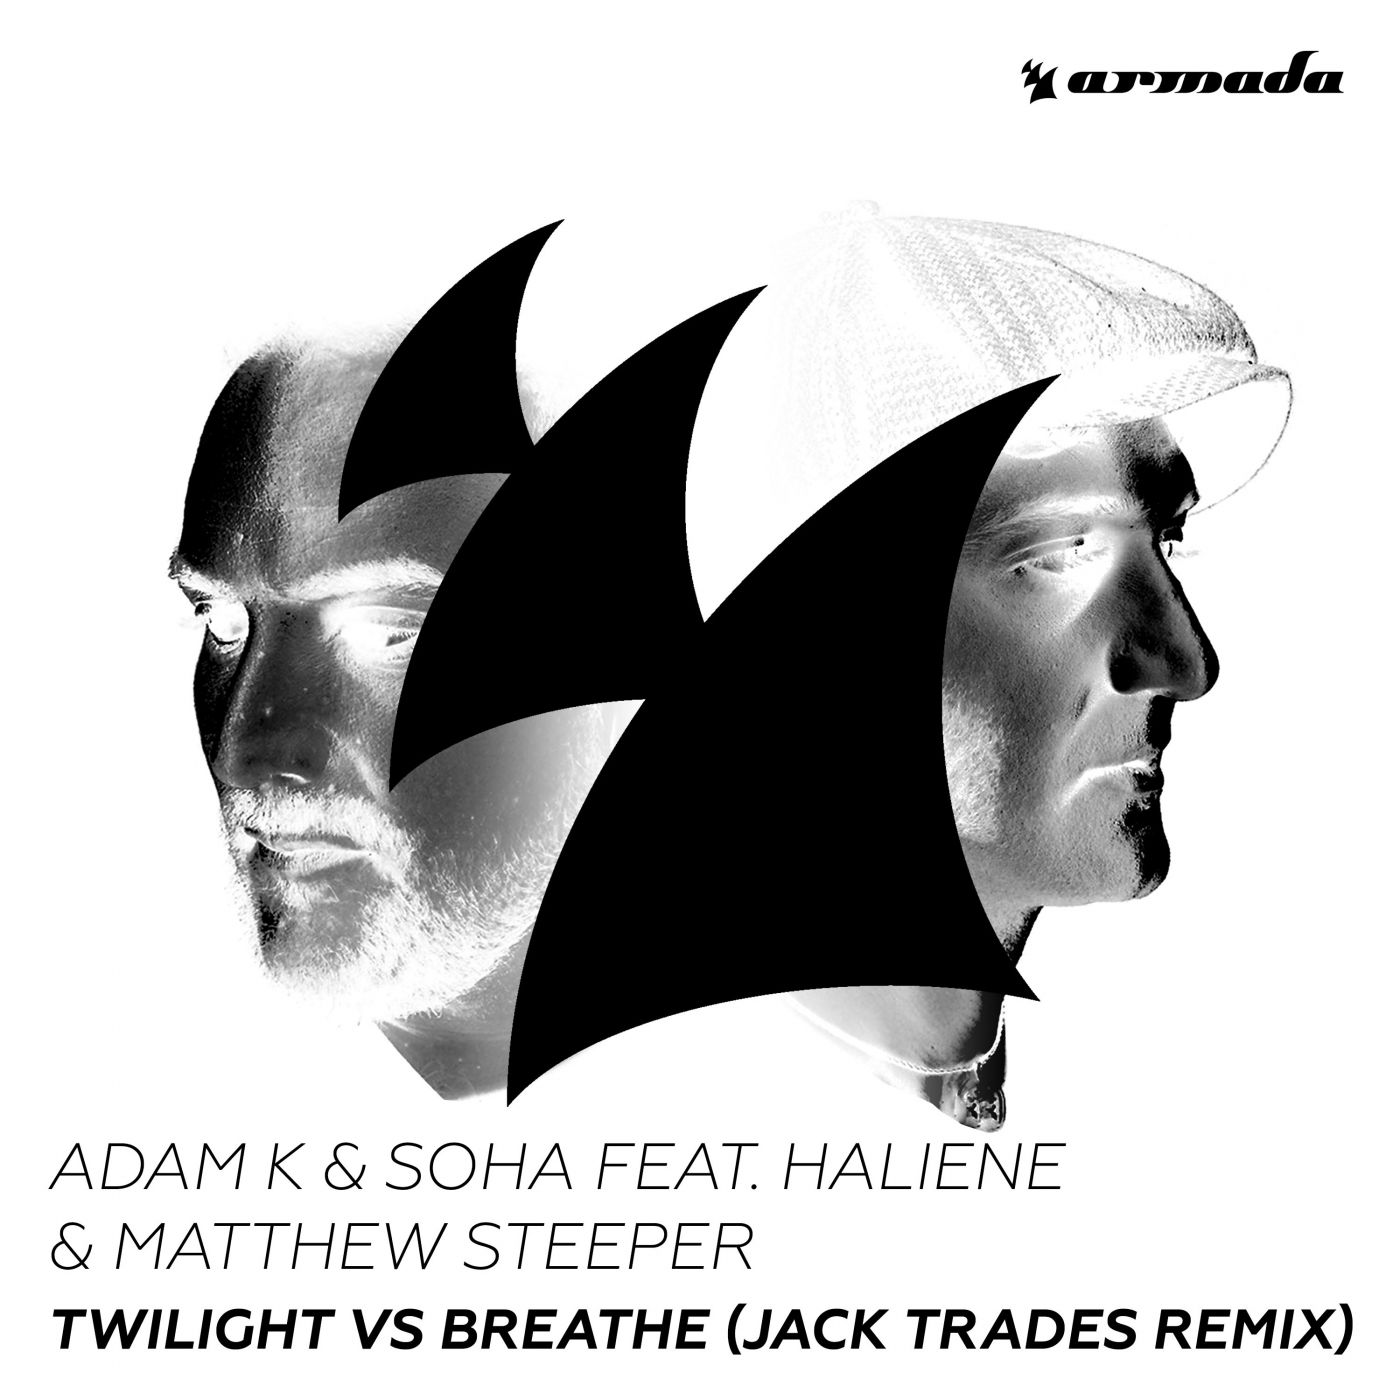 Adam K, Soha - Twilight vs Breathe feat HALIENE & Matthew Steeper ( Jack Trades Extended Remix)